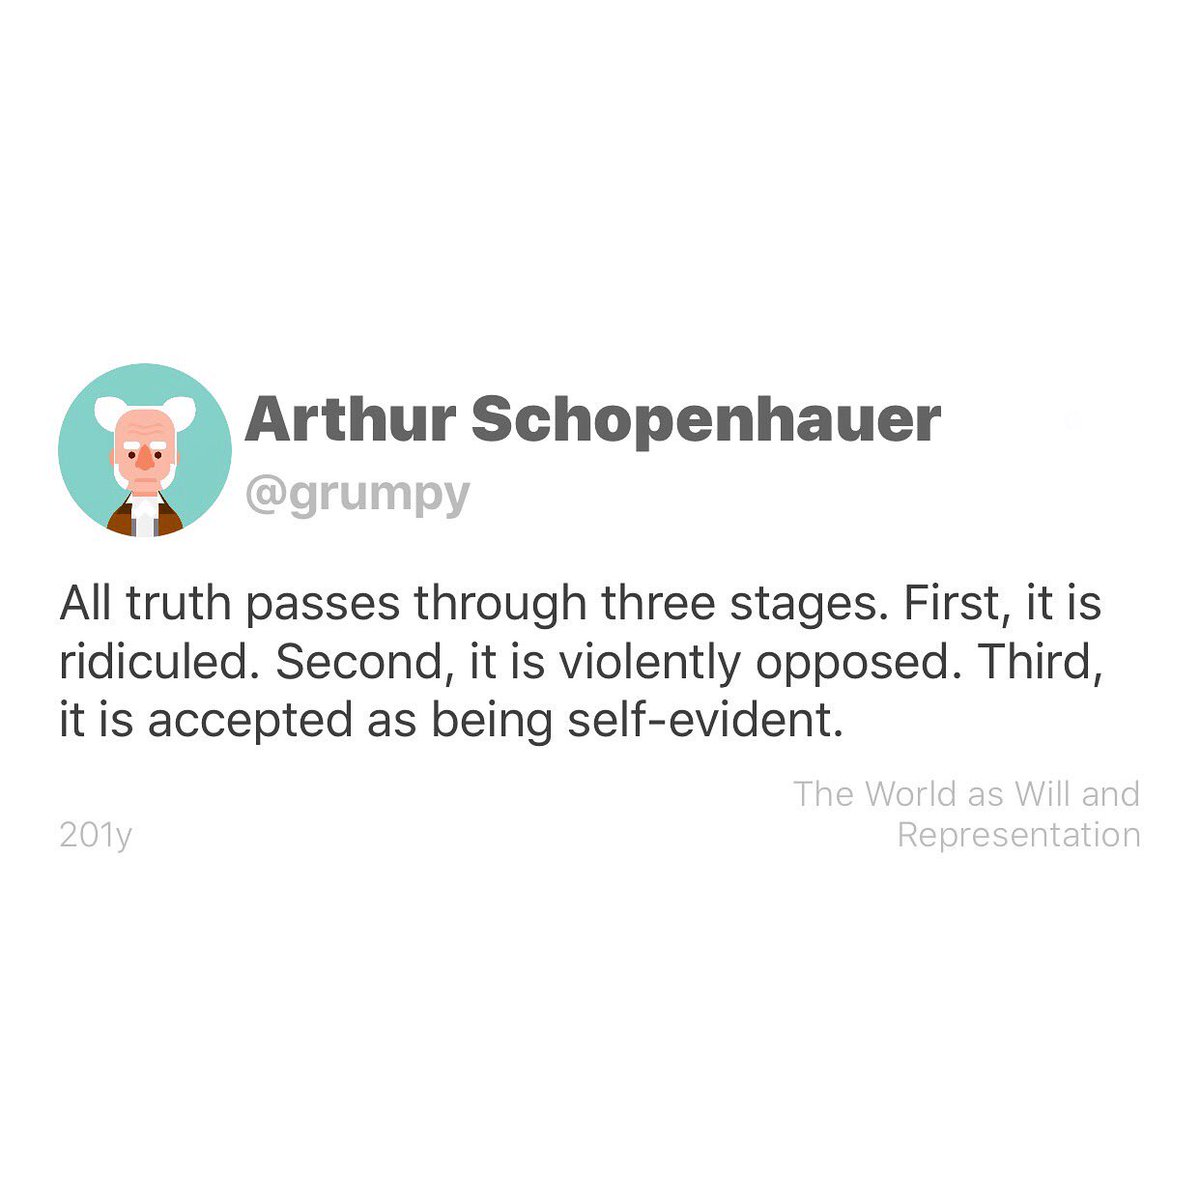 Happy birthday to German philosopher, known for his philosophical pessimism, Arthur Schopenhauer, born this day, 1788, in Danzig, Poland.  #philosophy #philosophyquotes #arthurschopenhauerpic.twitter.com/QqoSyXhF2U